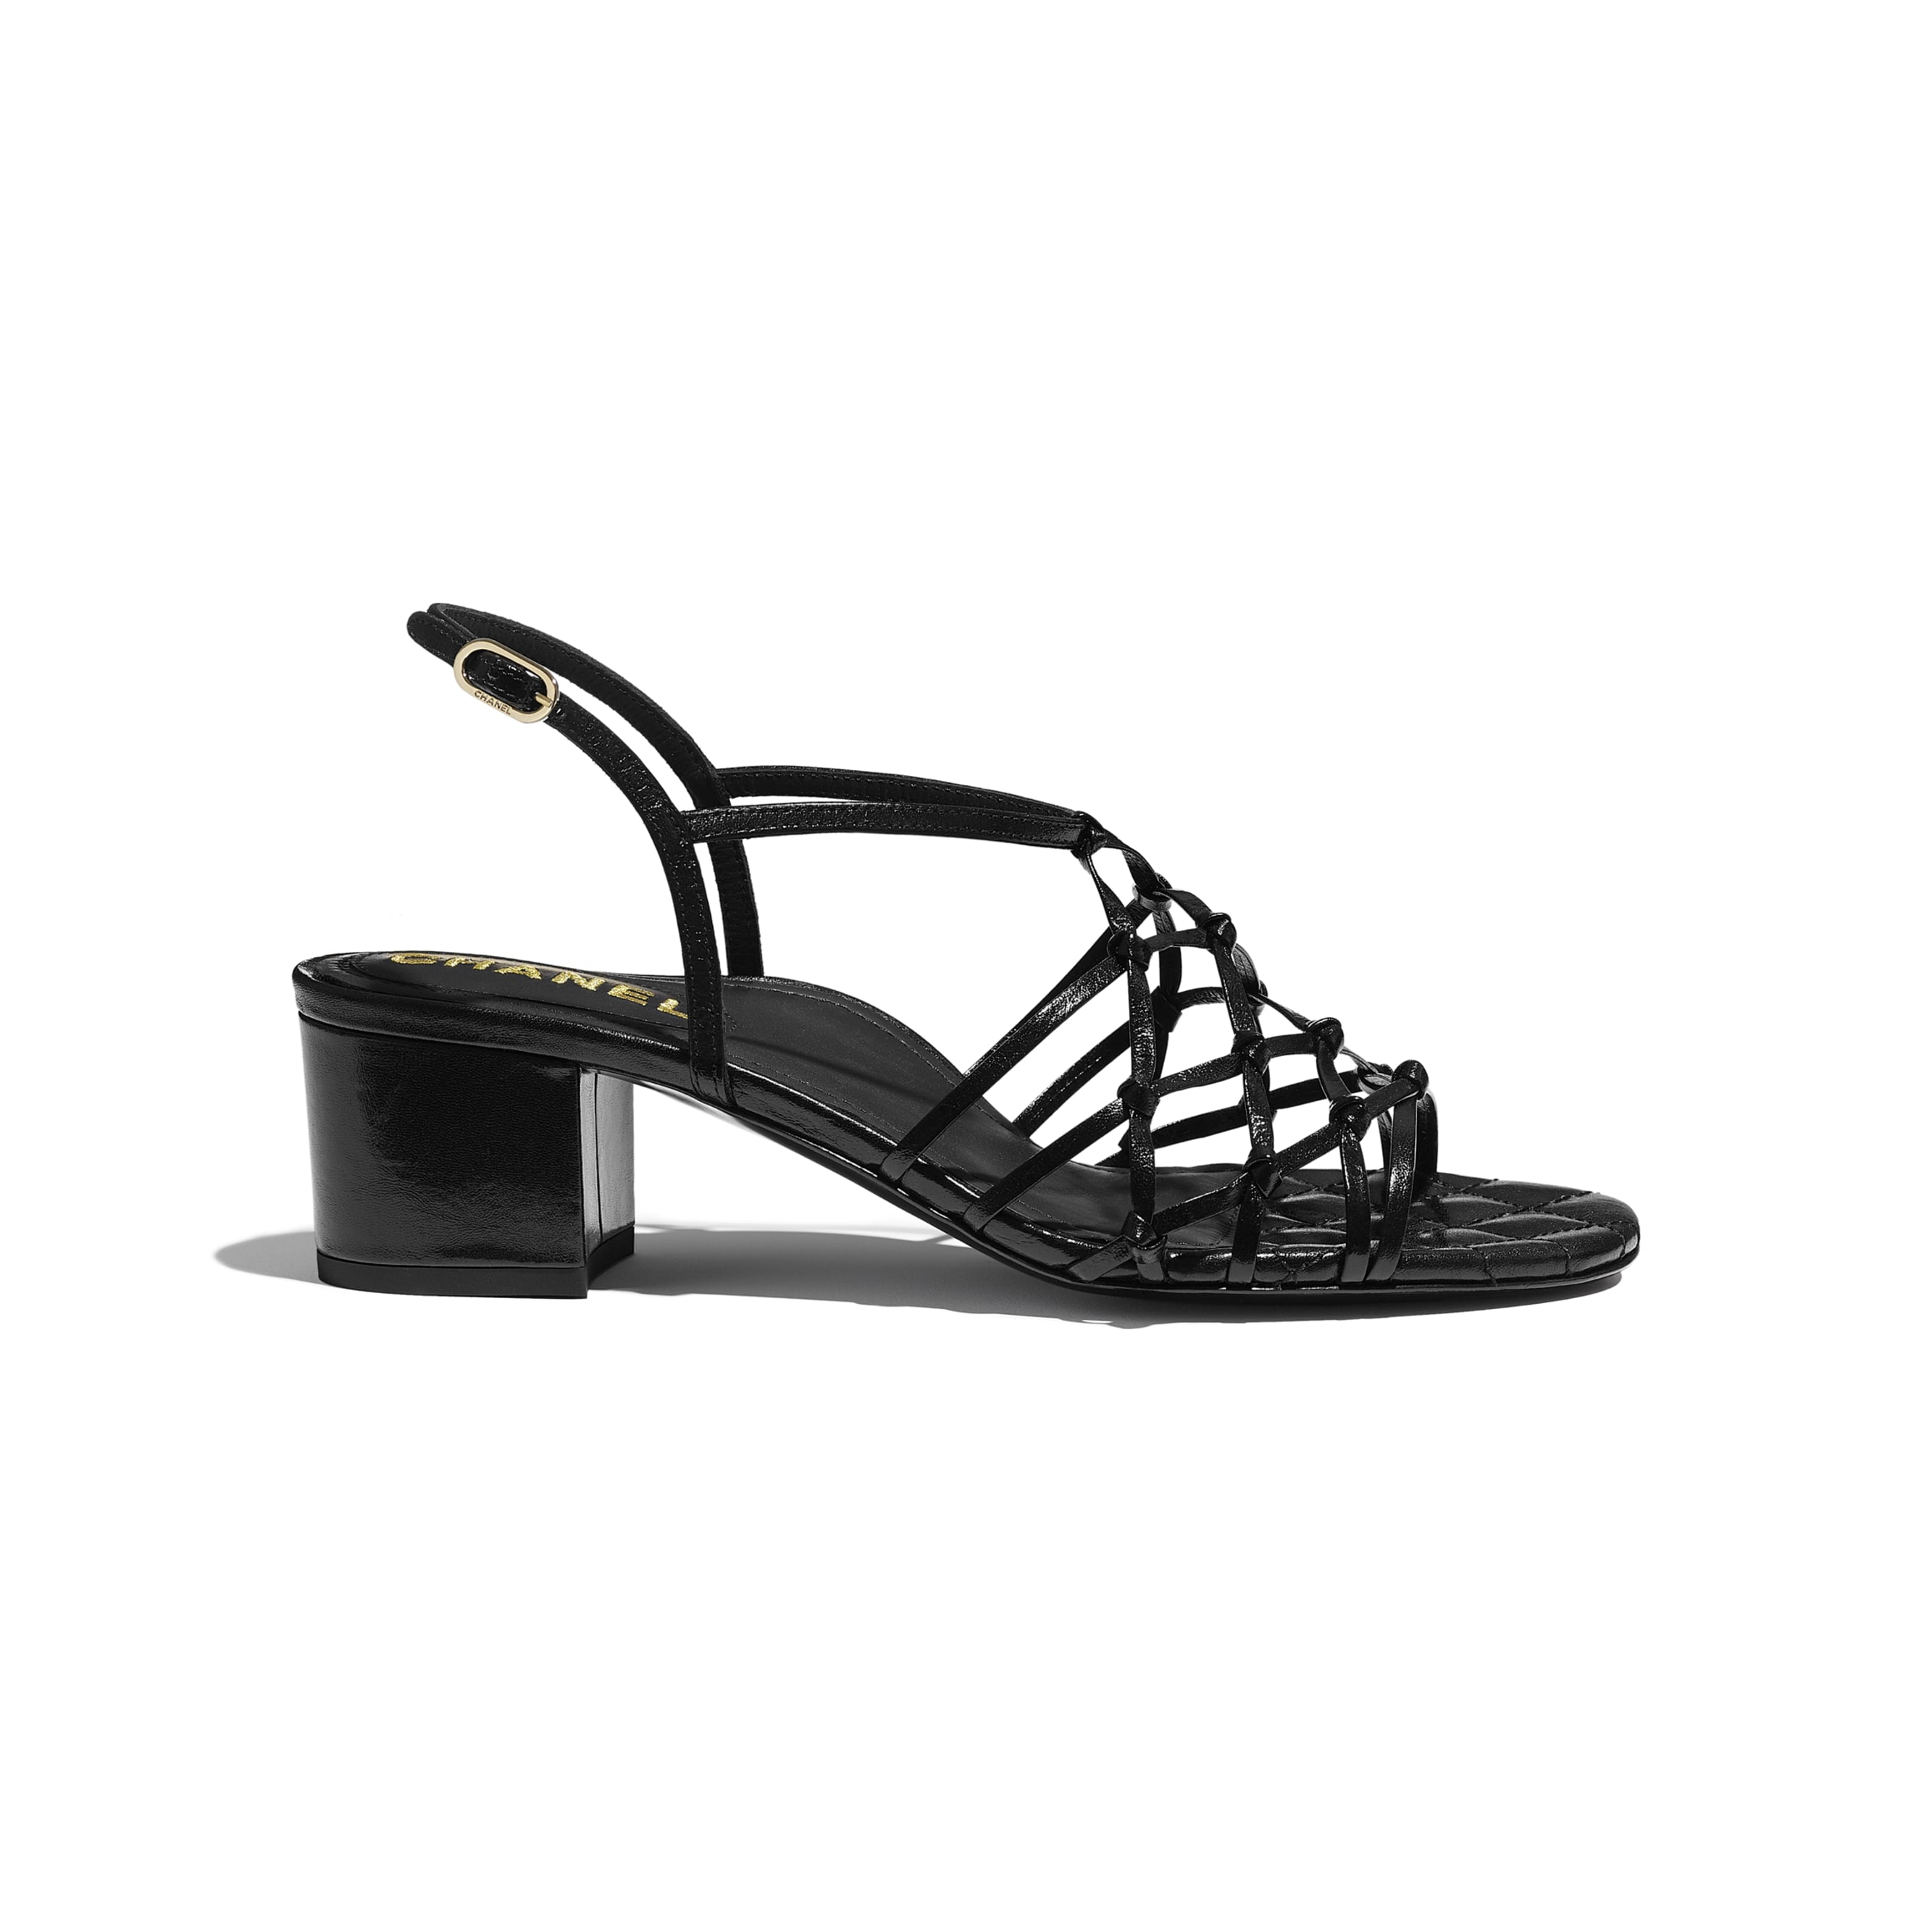 Sandals - Black - Iridescent Calfskin - CHANEL - Default view - see standard sized version